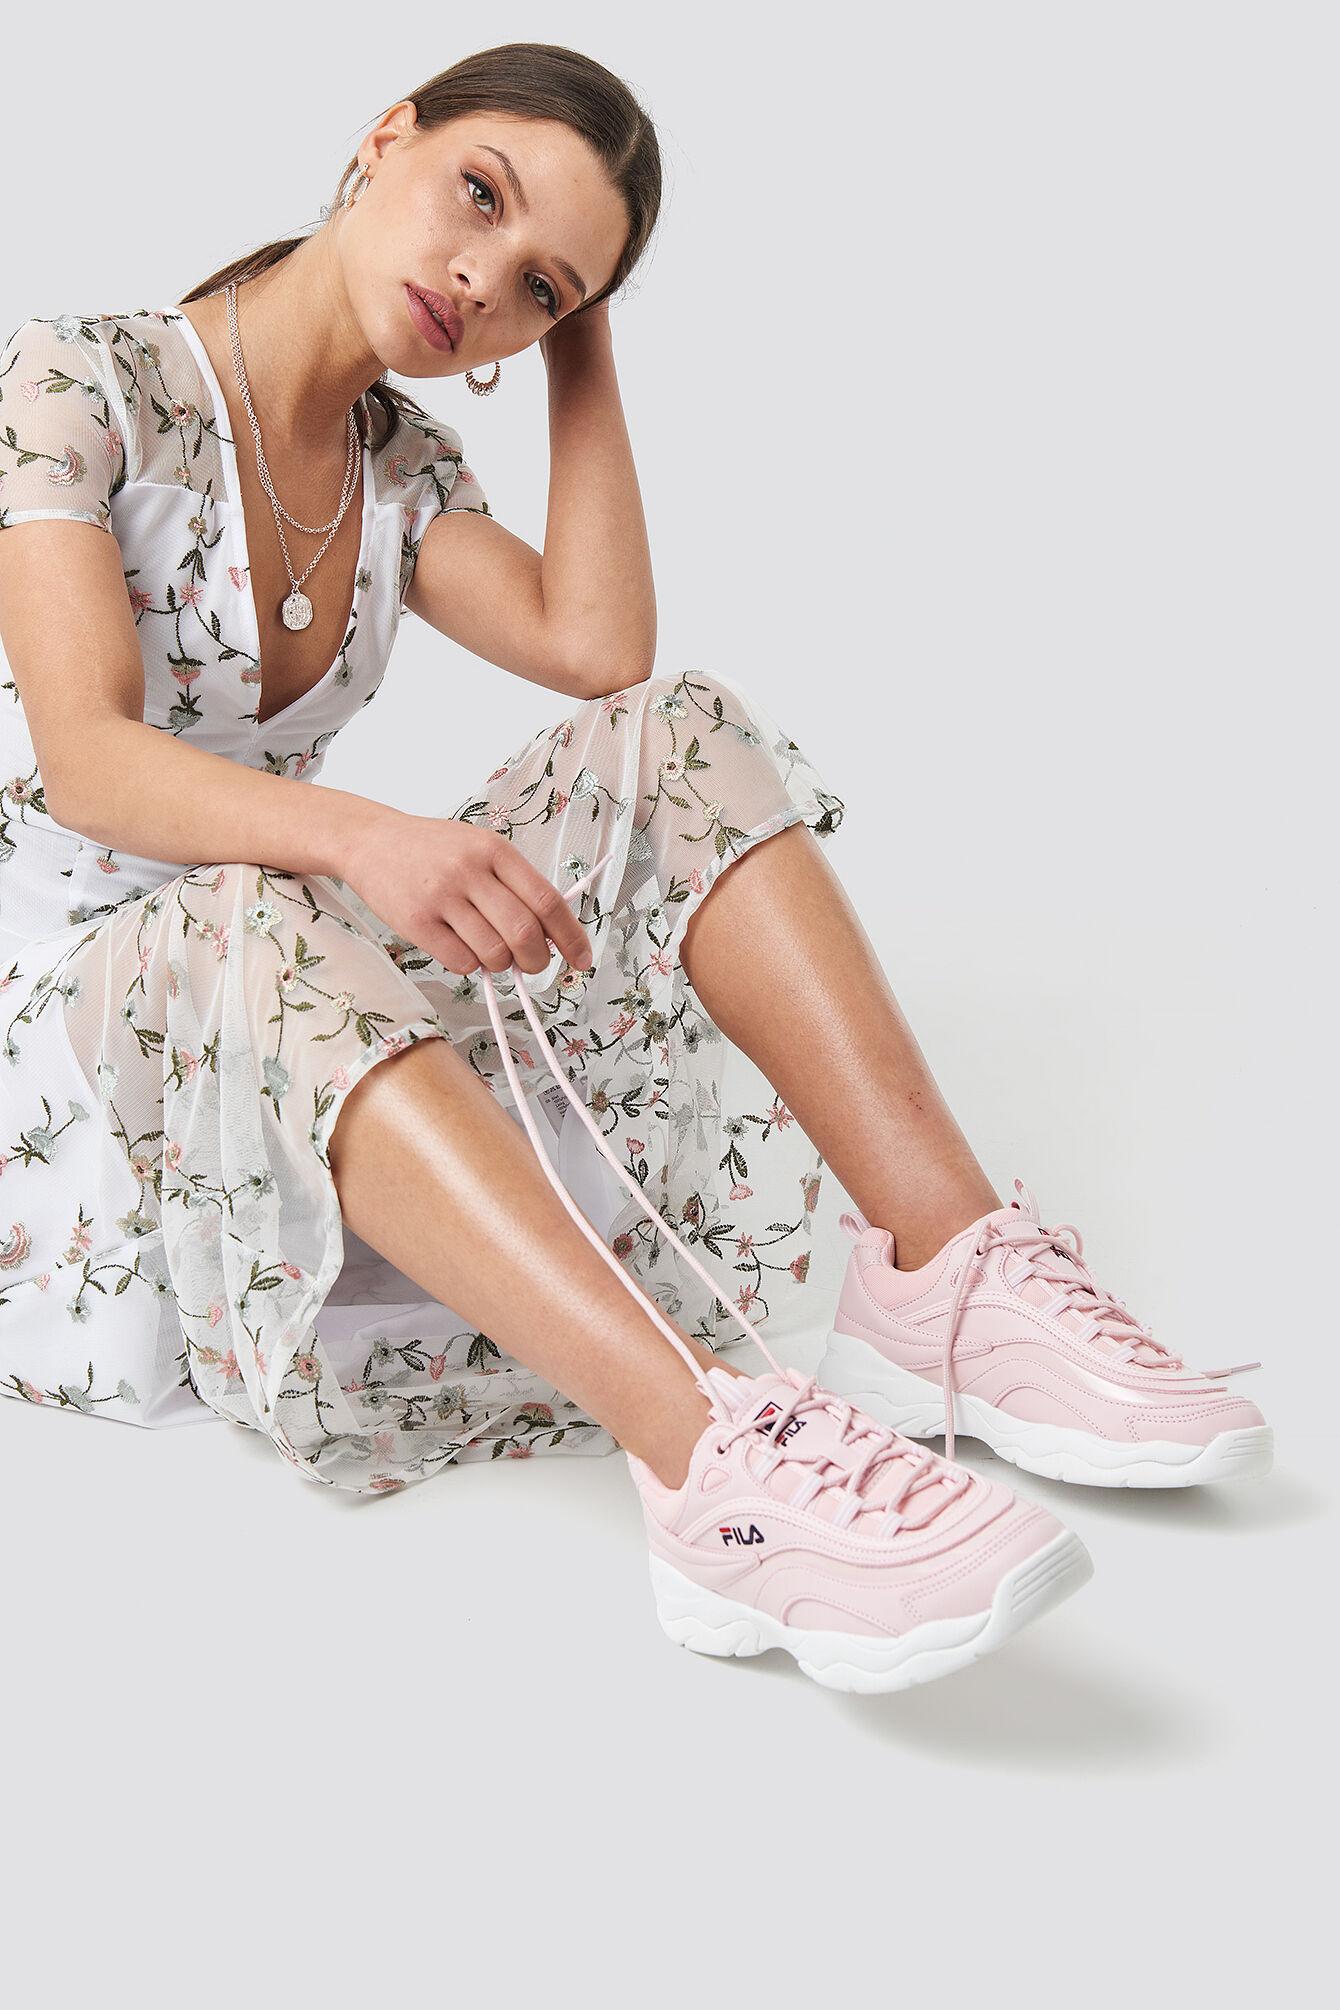 FILA Ray F Sneaker - Pink  - Size: EU 36,EU 37,EU 38,EU 39,EU 40,EU 41